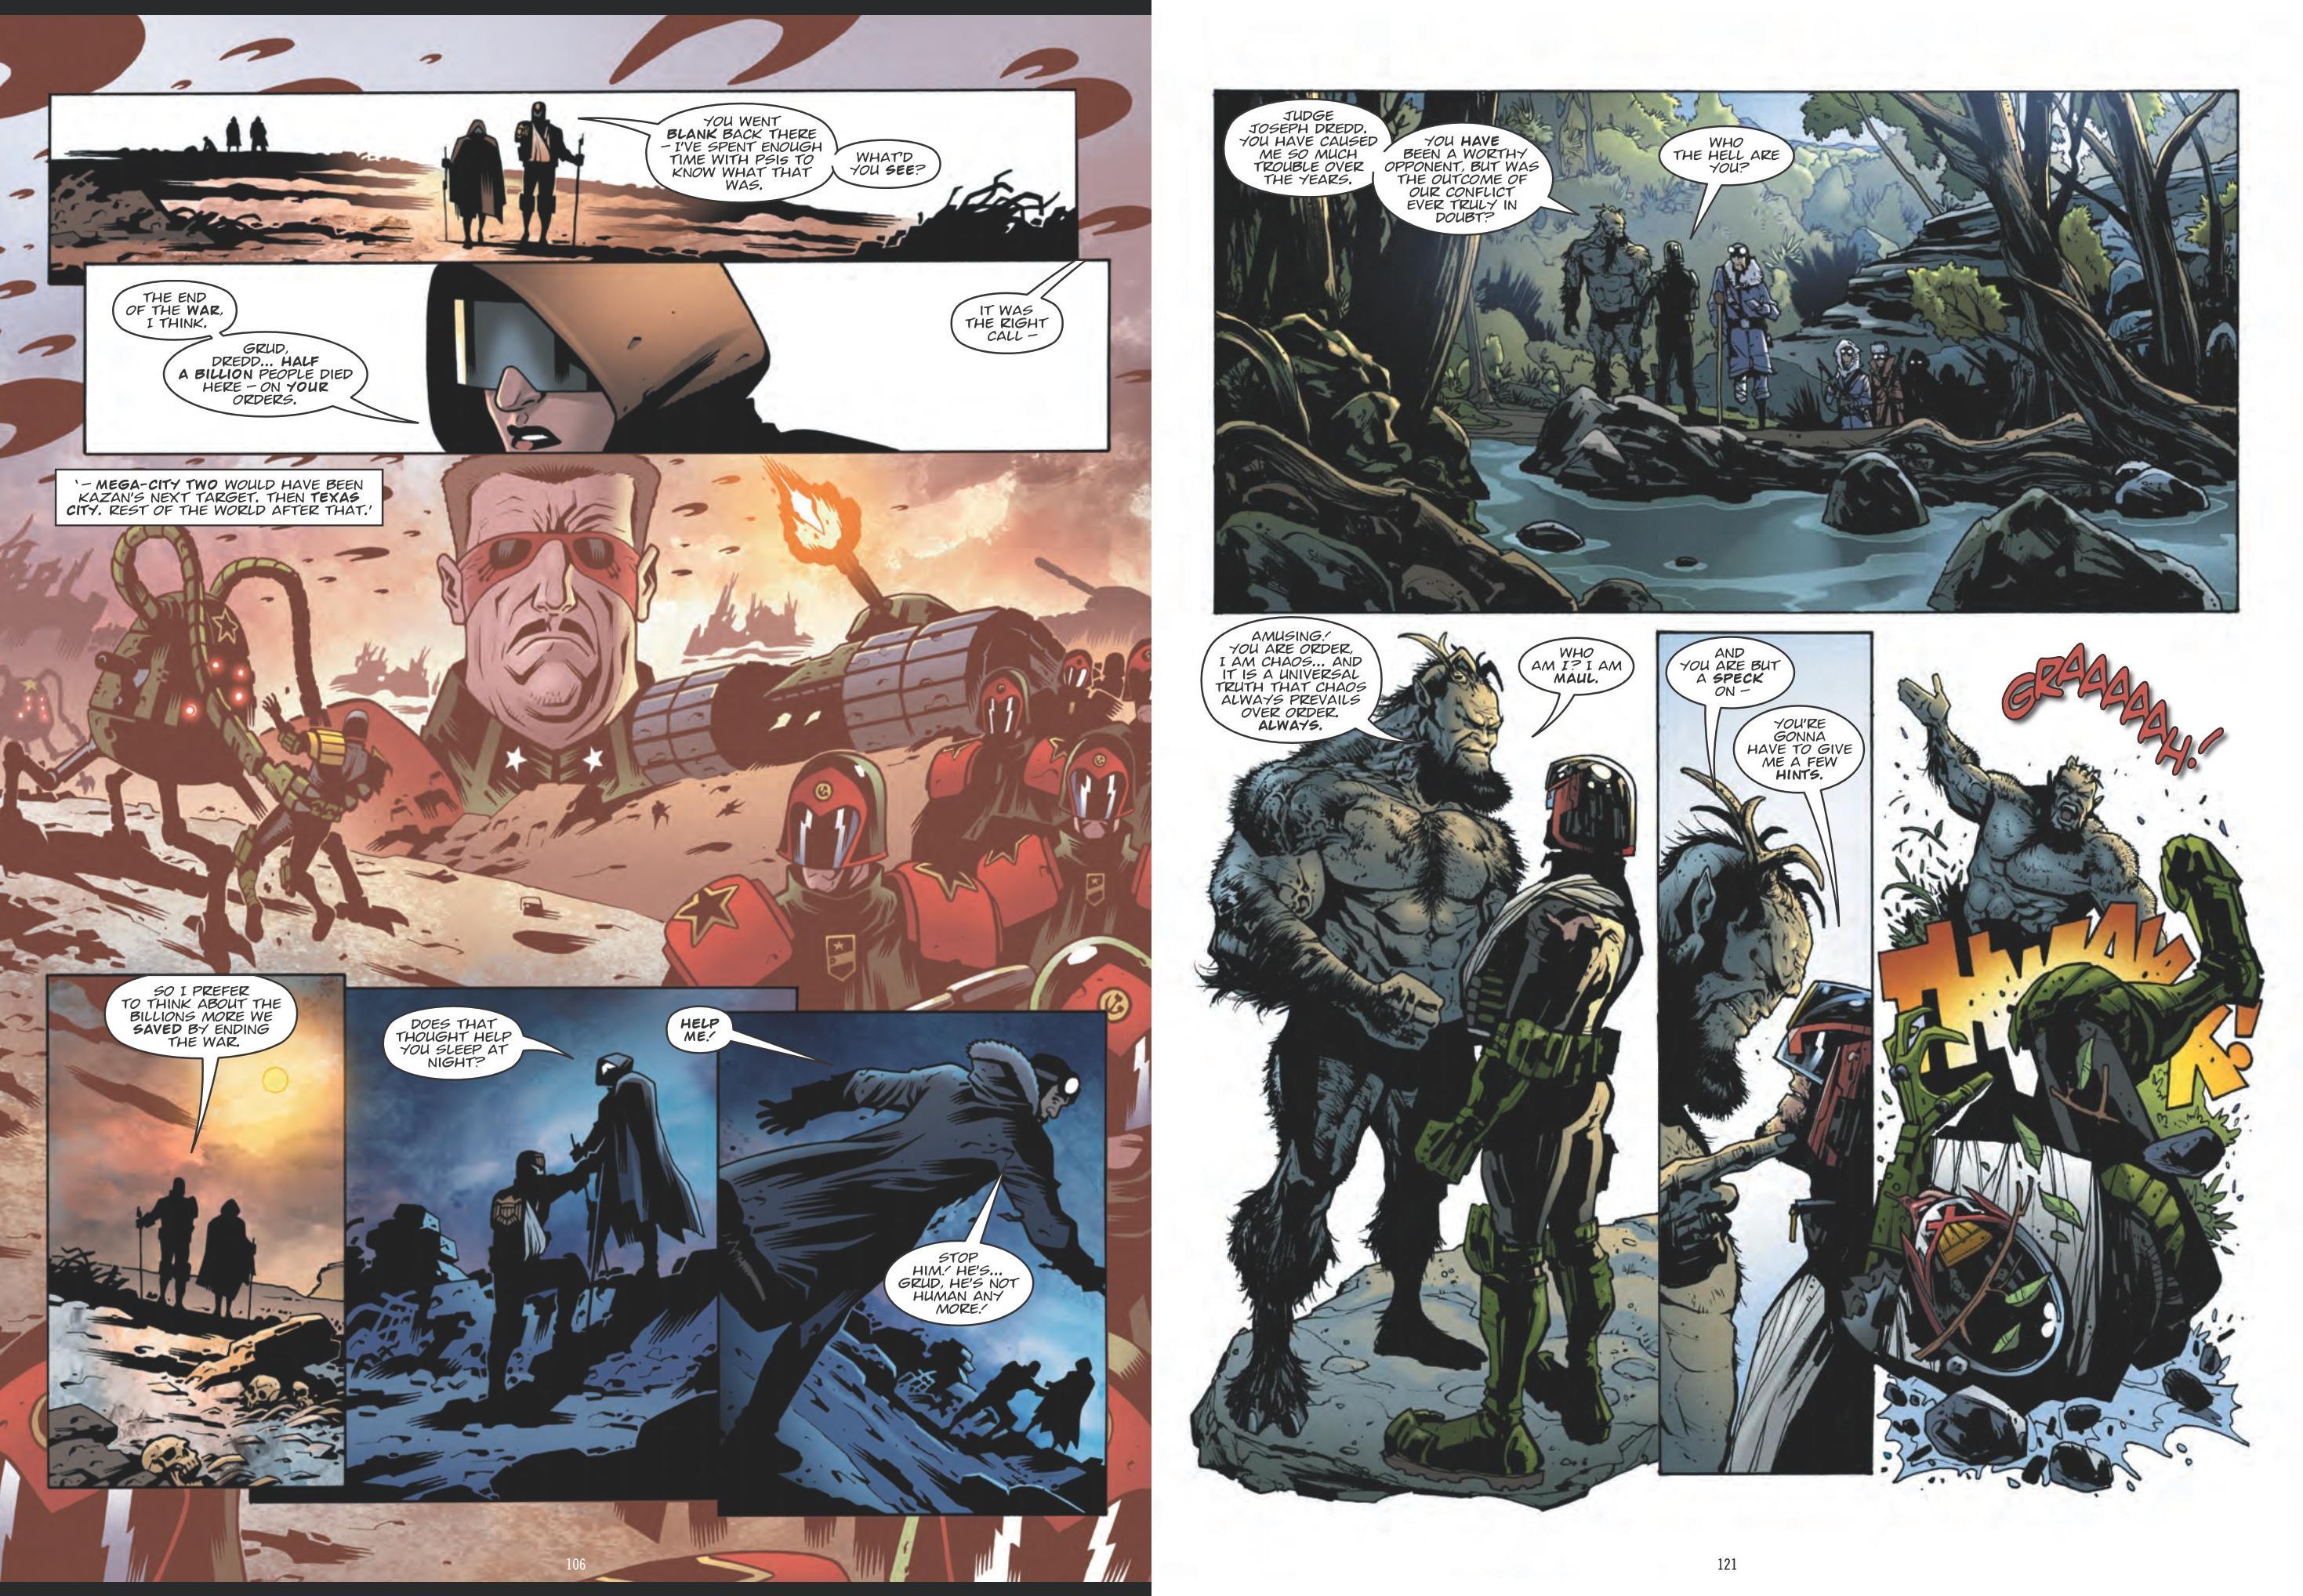 Judge Dredd - Cold Wars review